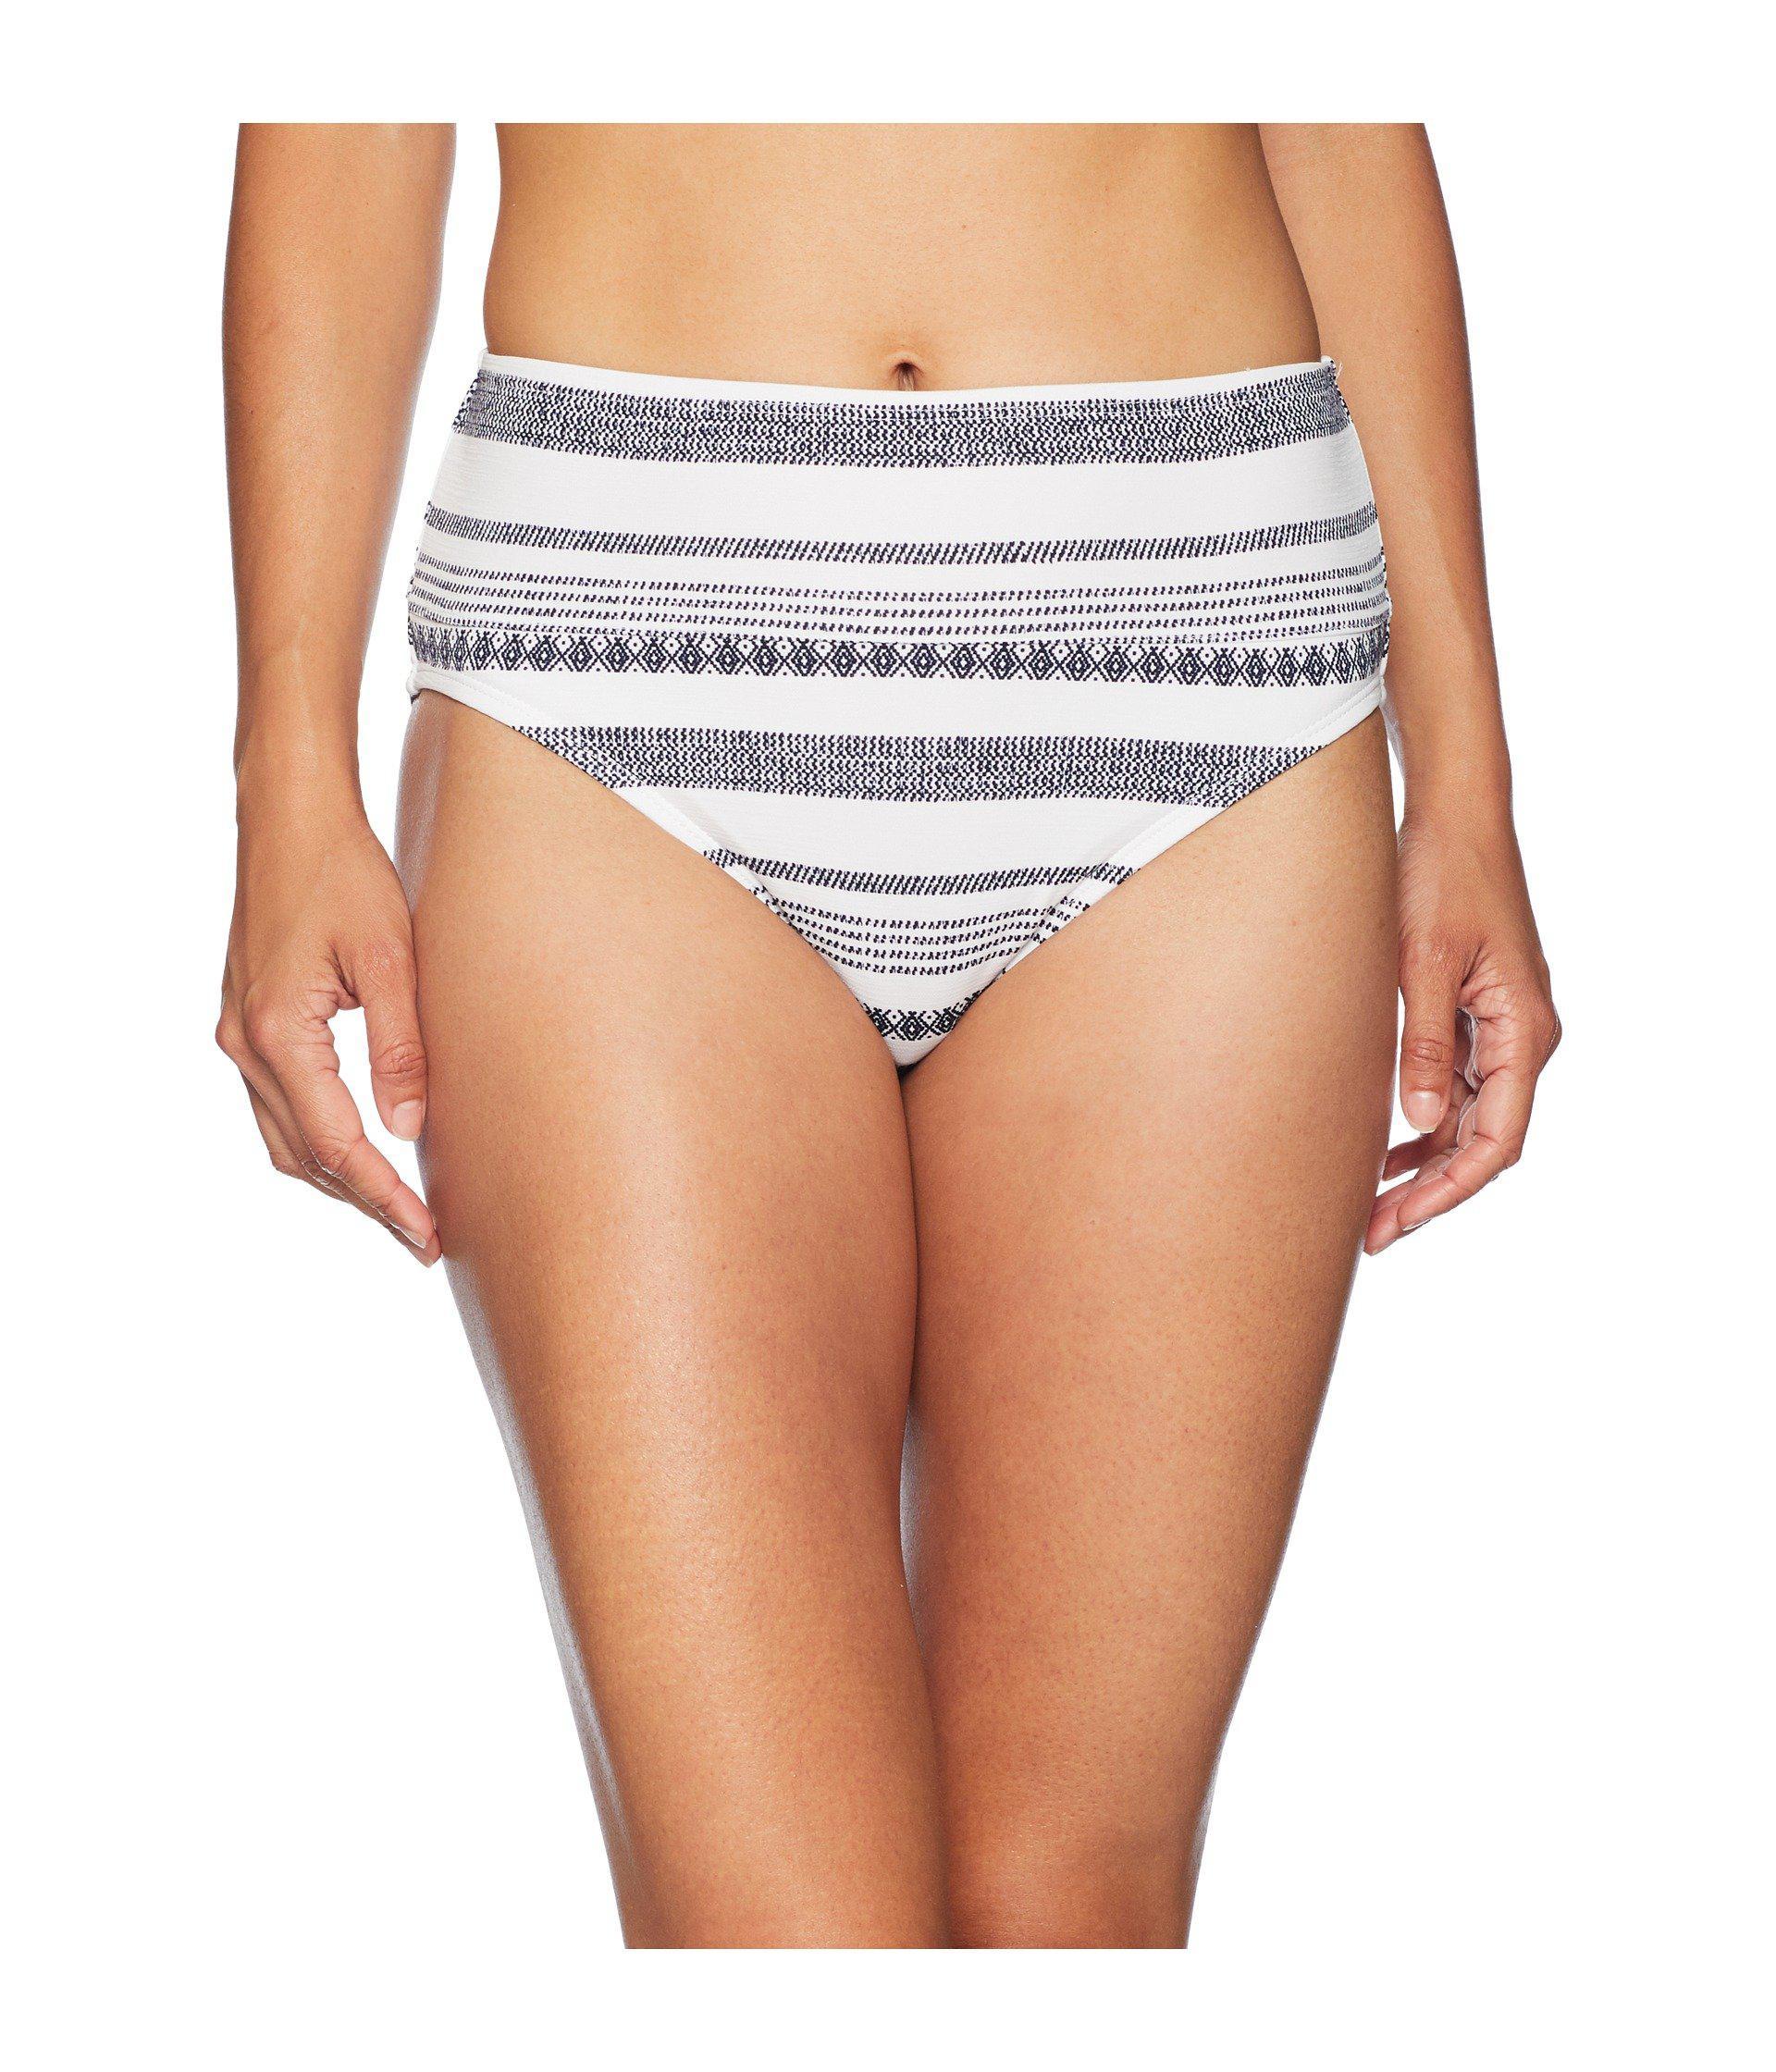 ae2d4b746d Lyst - Tommy Bahama Sandbar Wide Band High-waist Bottom in White